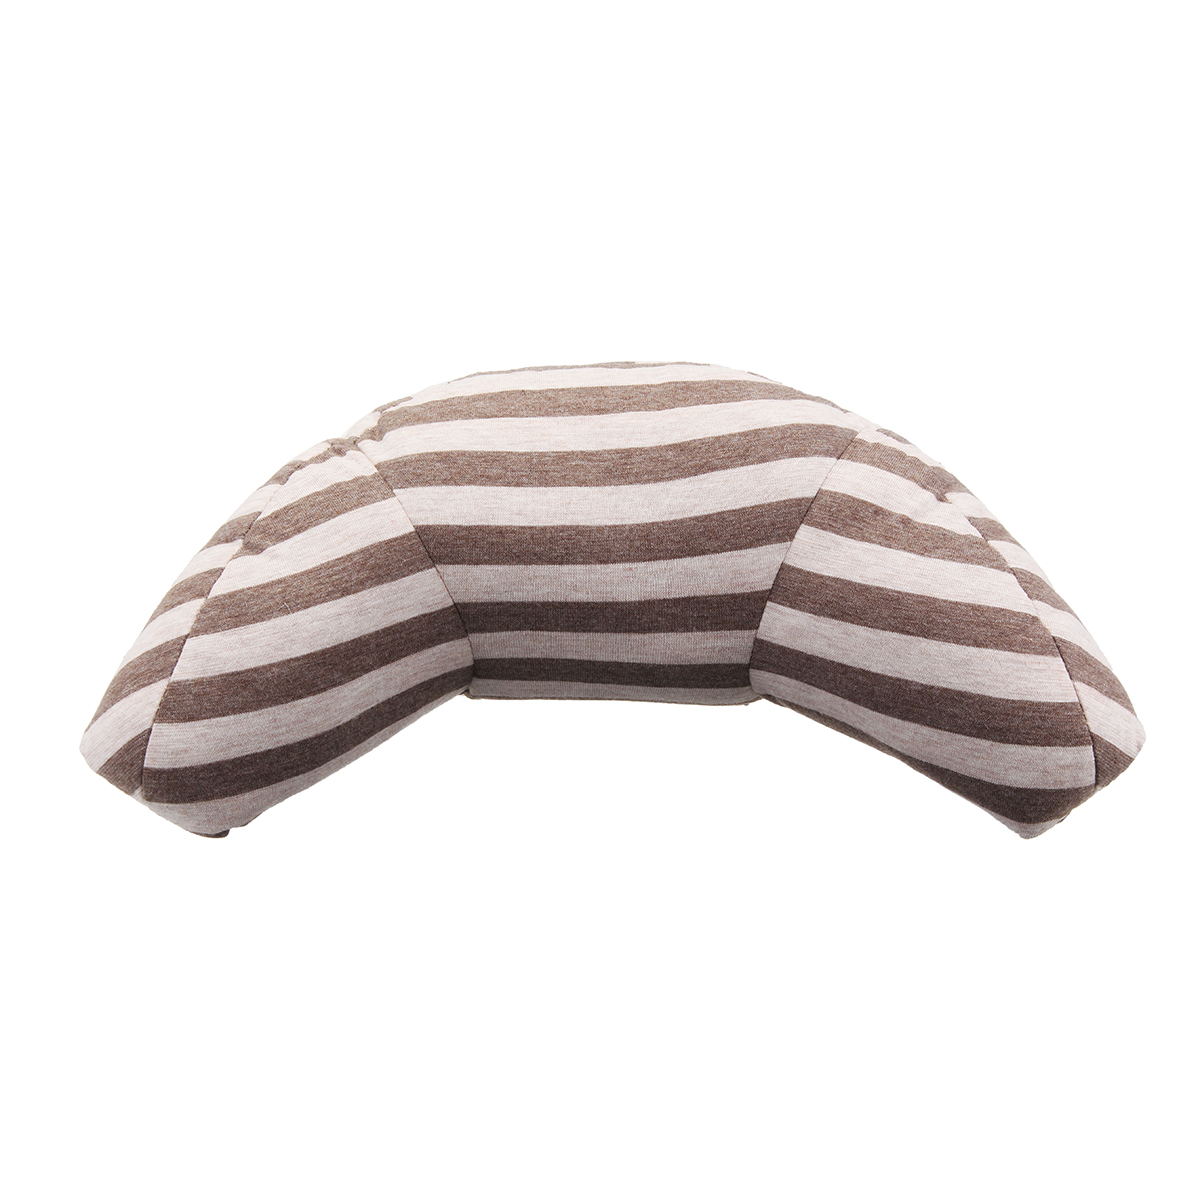 Strip Style Child Neck Headrest Car Seat Belt Shoulder Pads Car Sleep Pillow Head Support Cushion